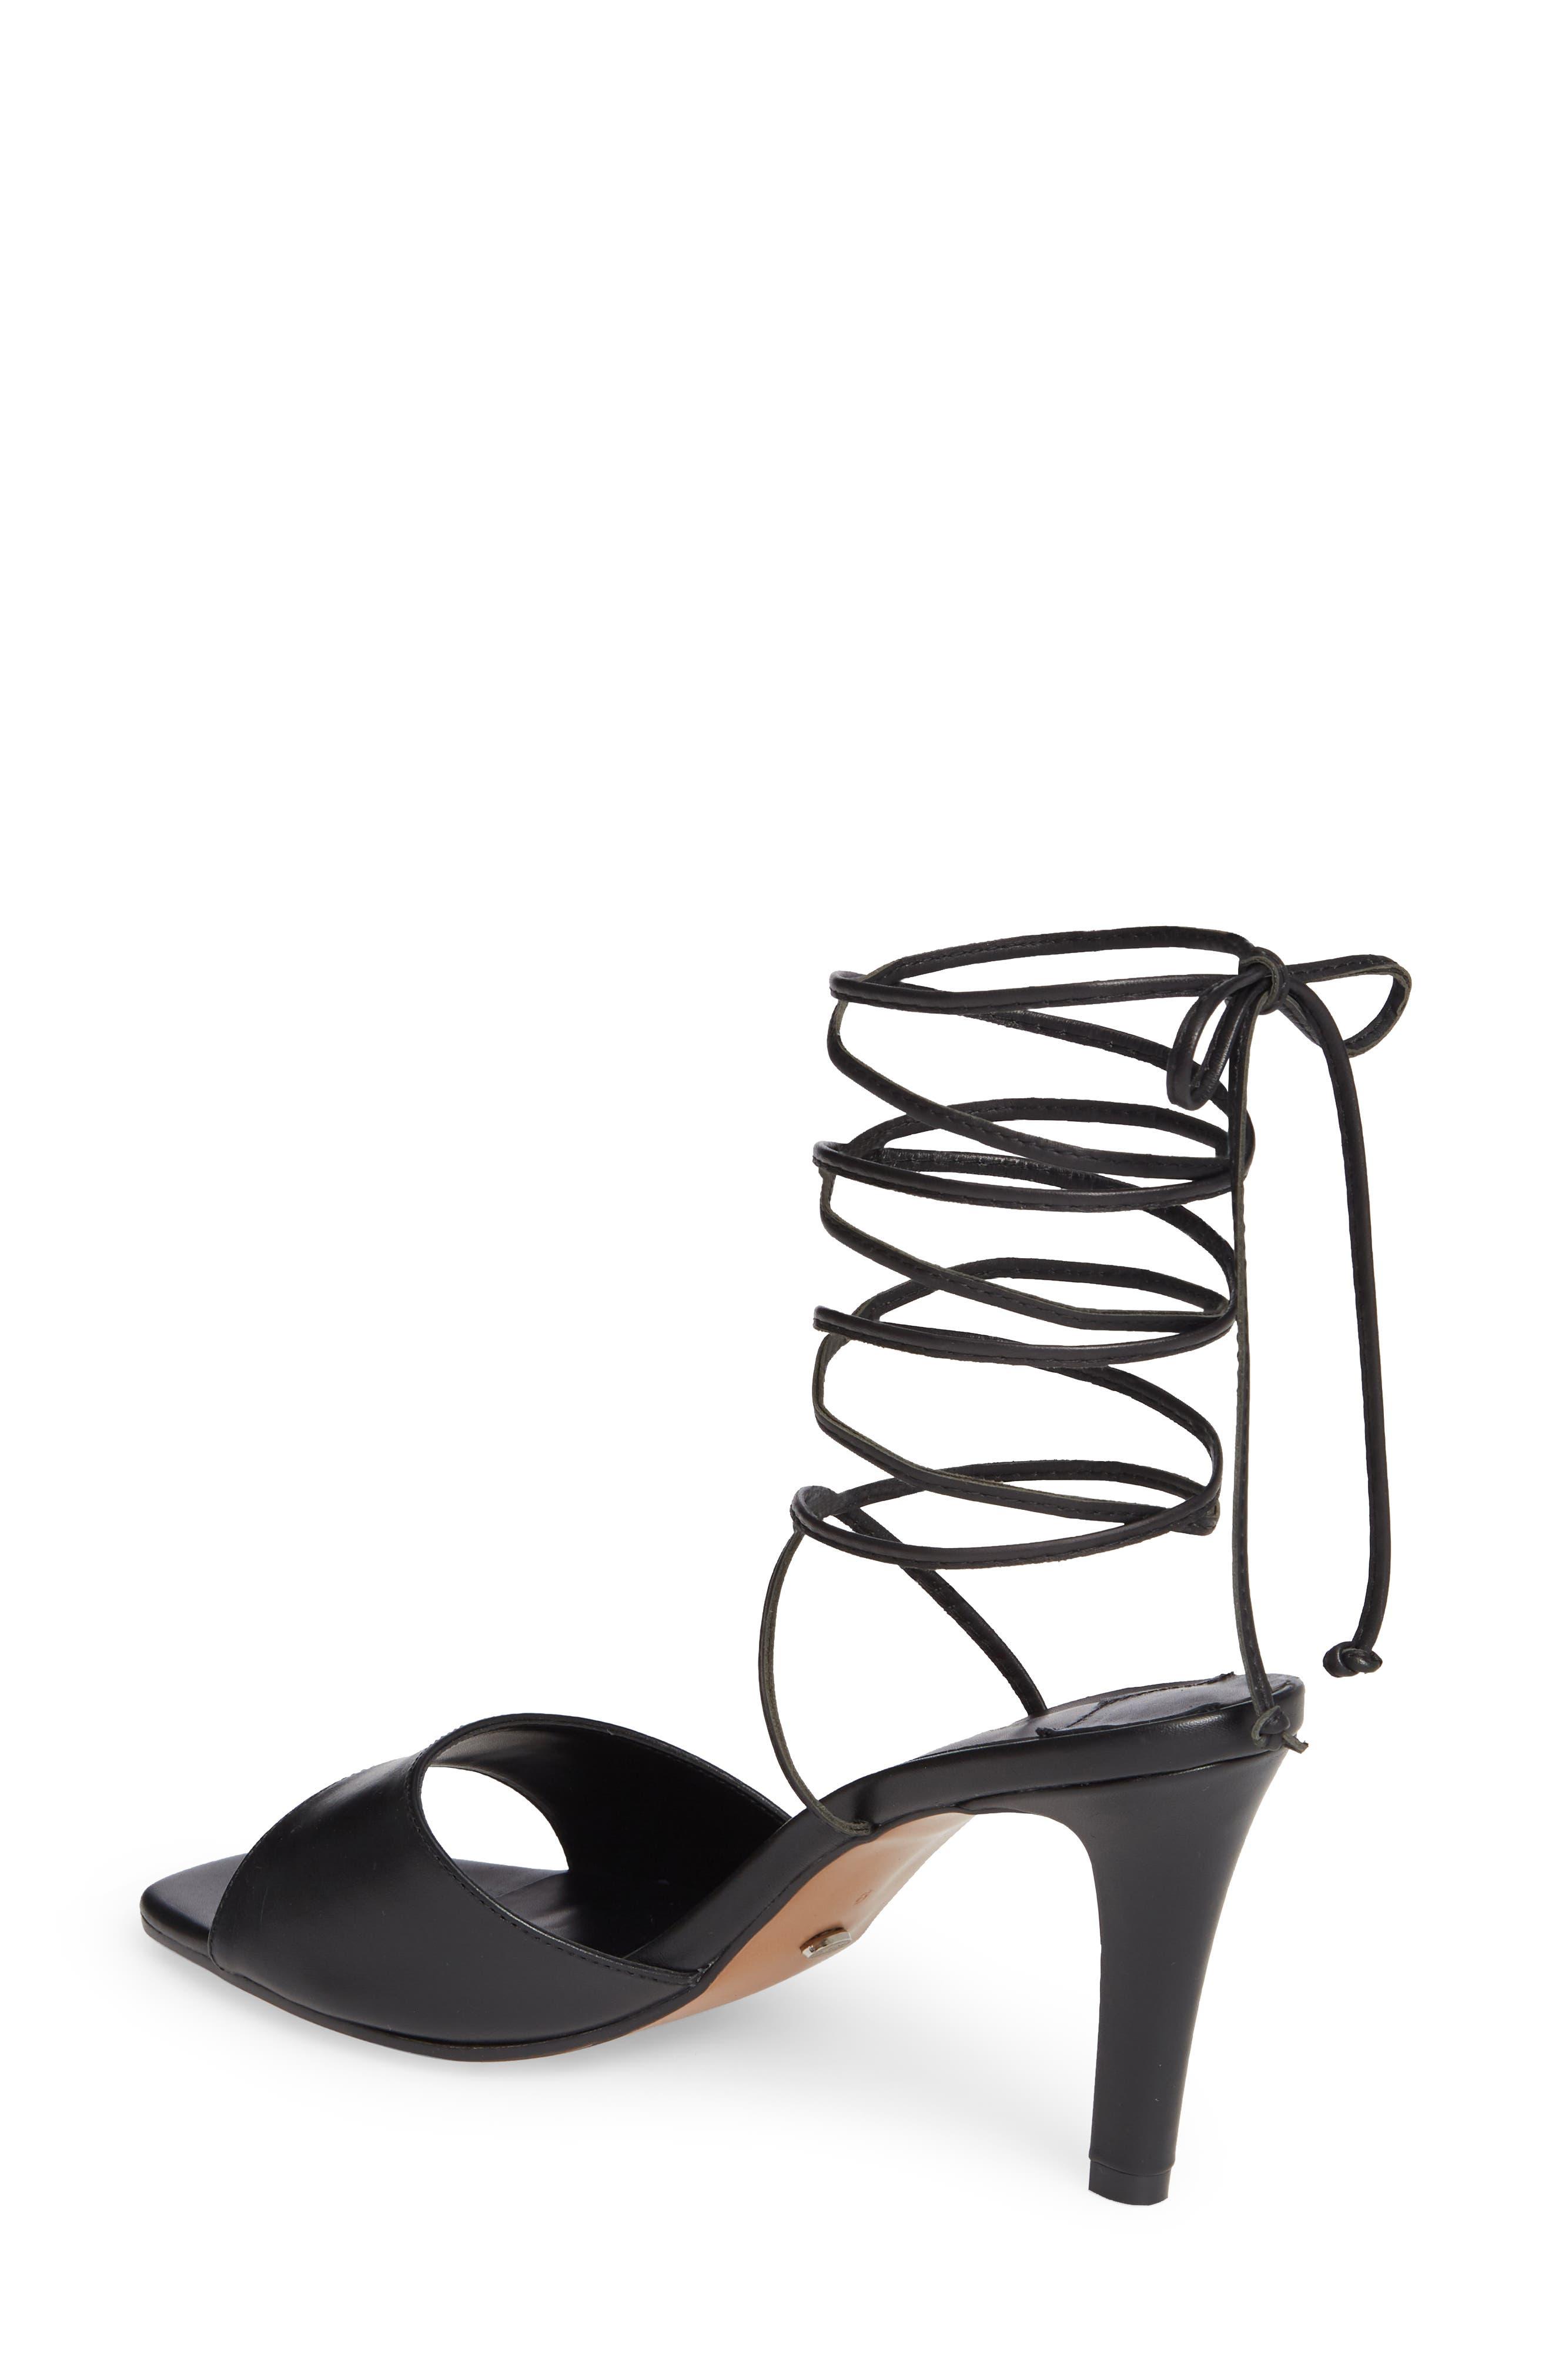 Ruffian Wraparound Sandal,                             Alternate thumbnail 2, color,                             BLACK COMO